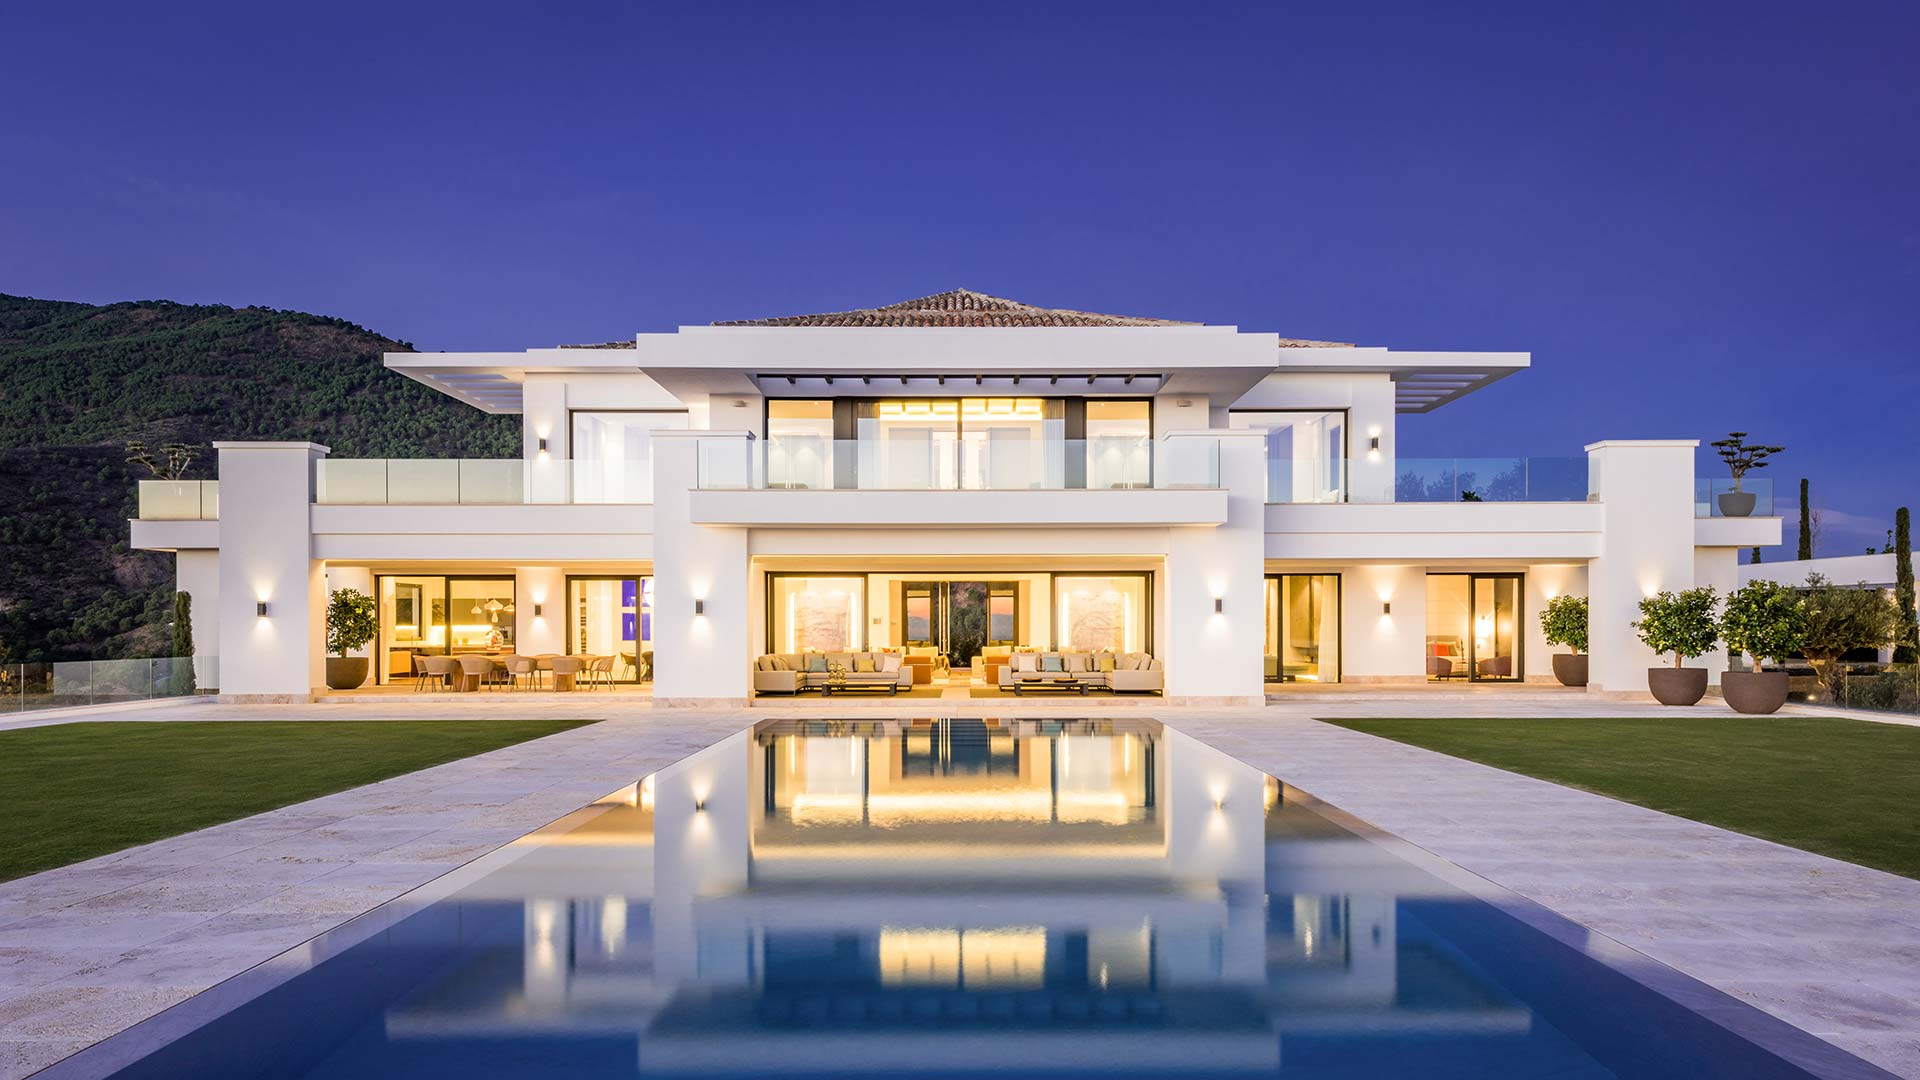 Mansiones en La Zagaleta, Benahavis-Marbella